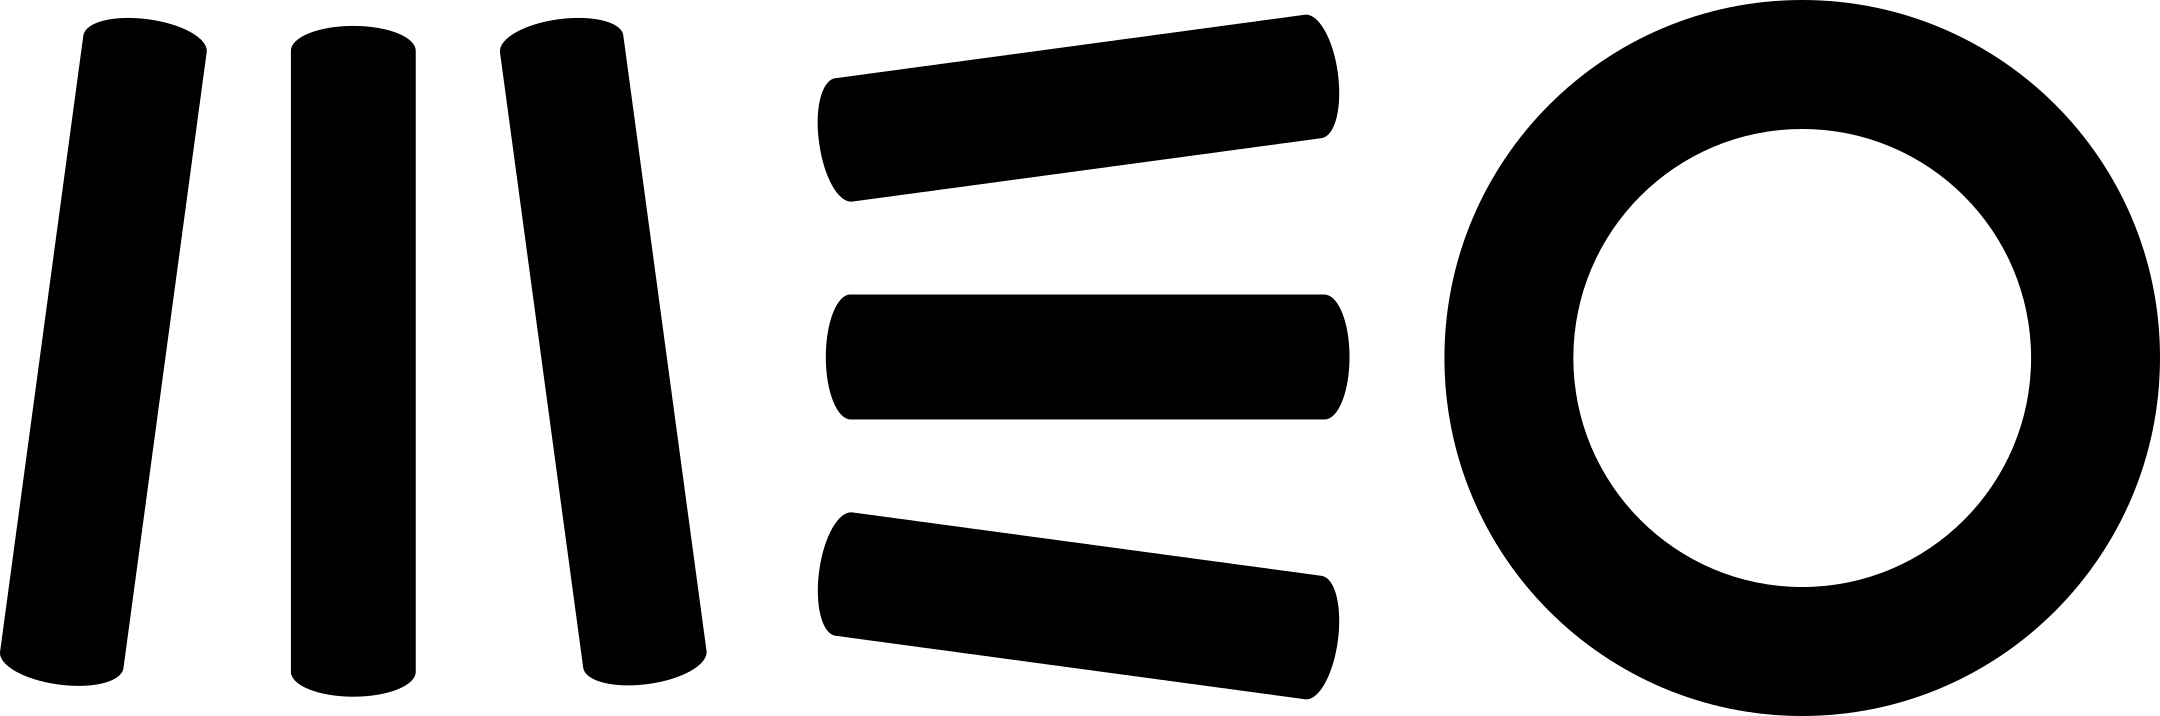 meo logo 1 - MEO Logo